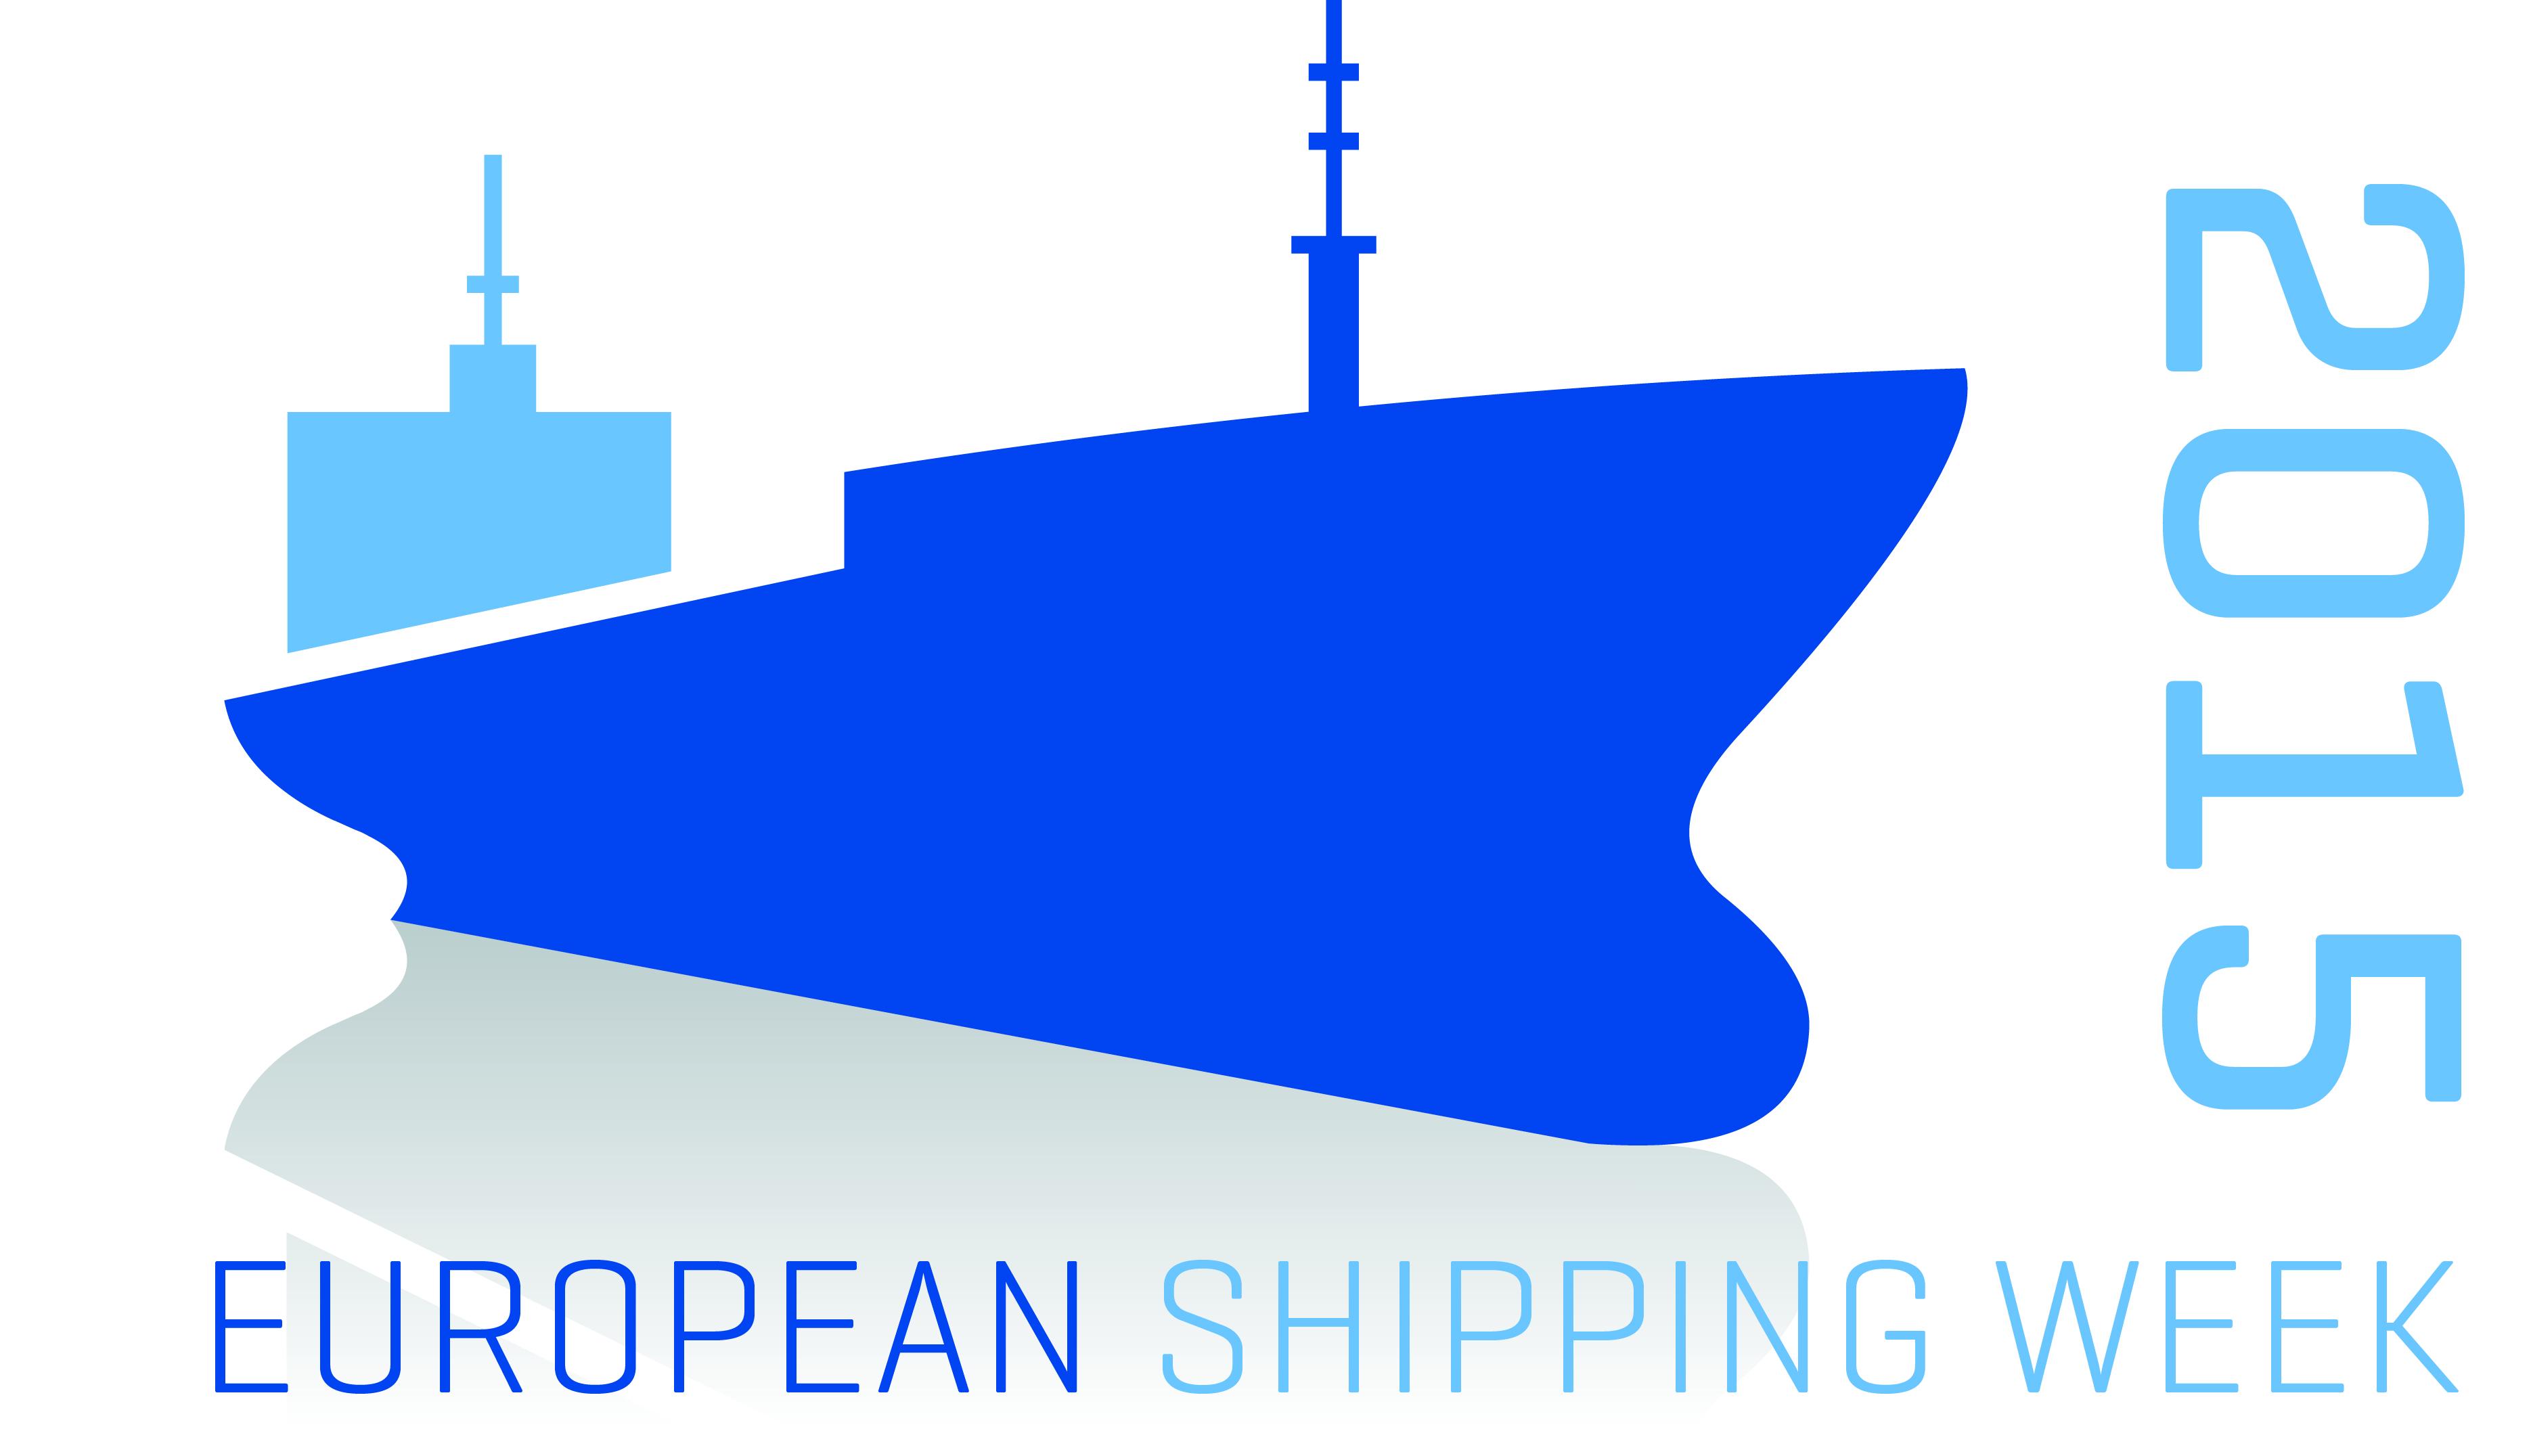 Välkommen till CNSS workshop i Bryssel under European Shipping Week